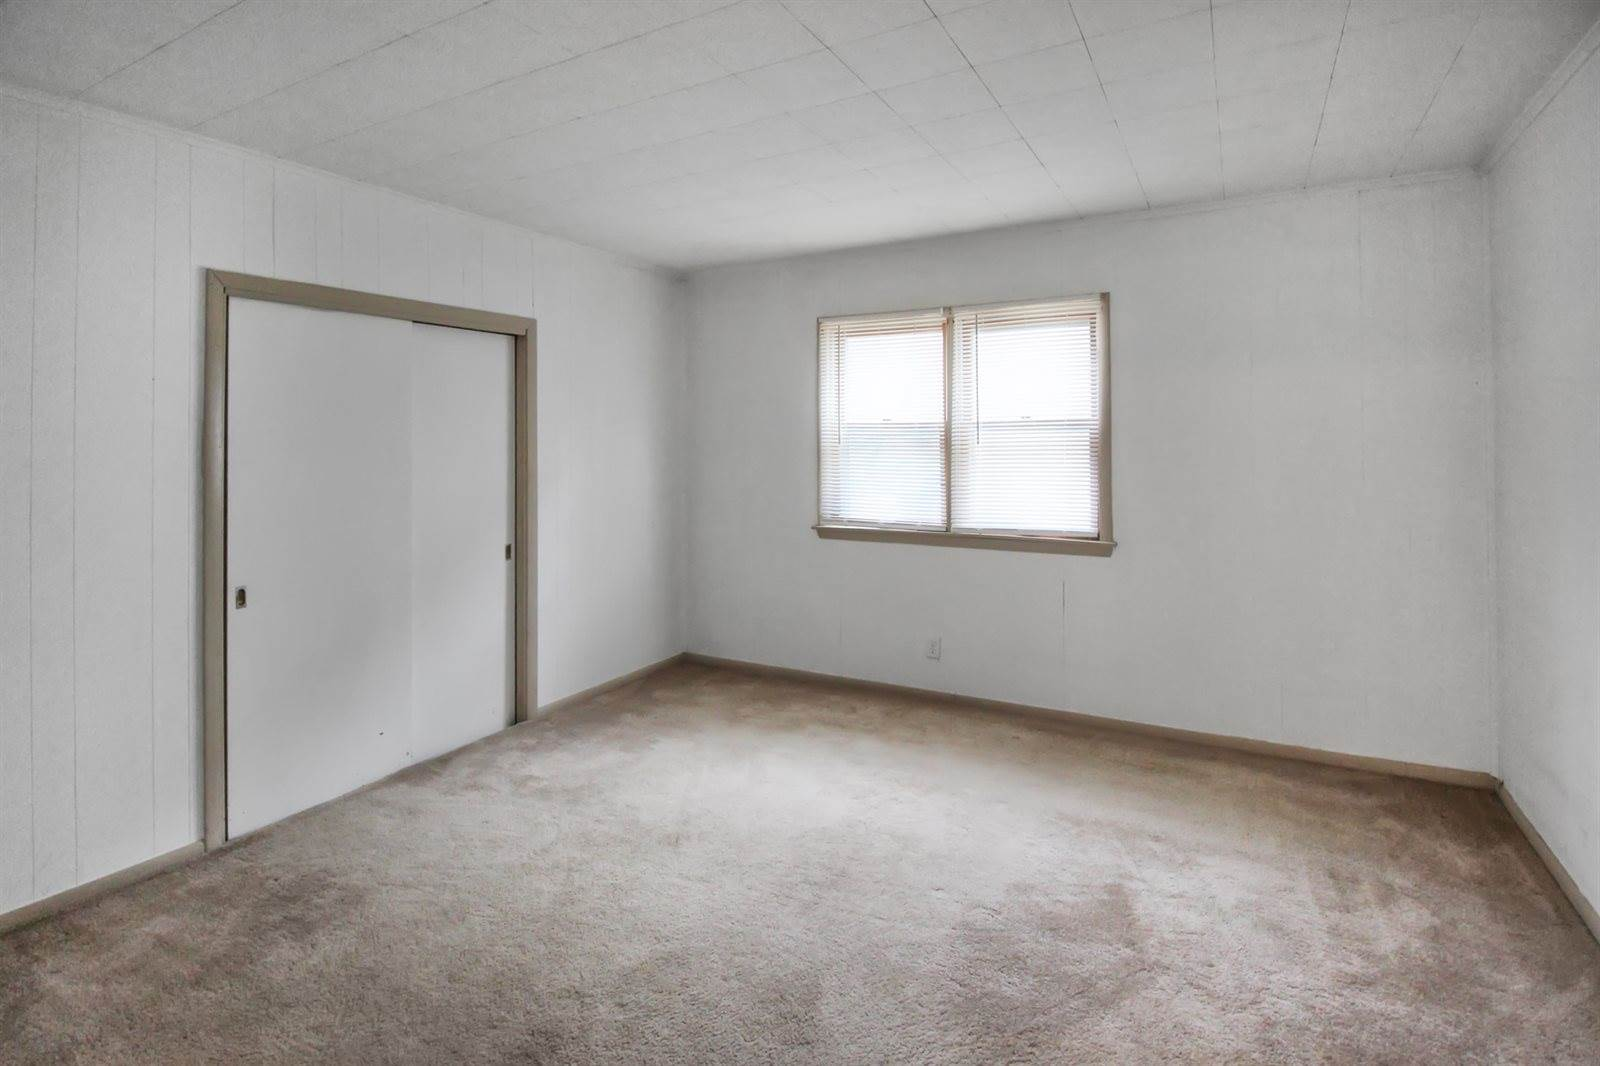 249 North Foley Avenue, Freeport, IL 61032